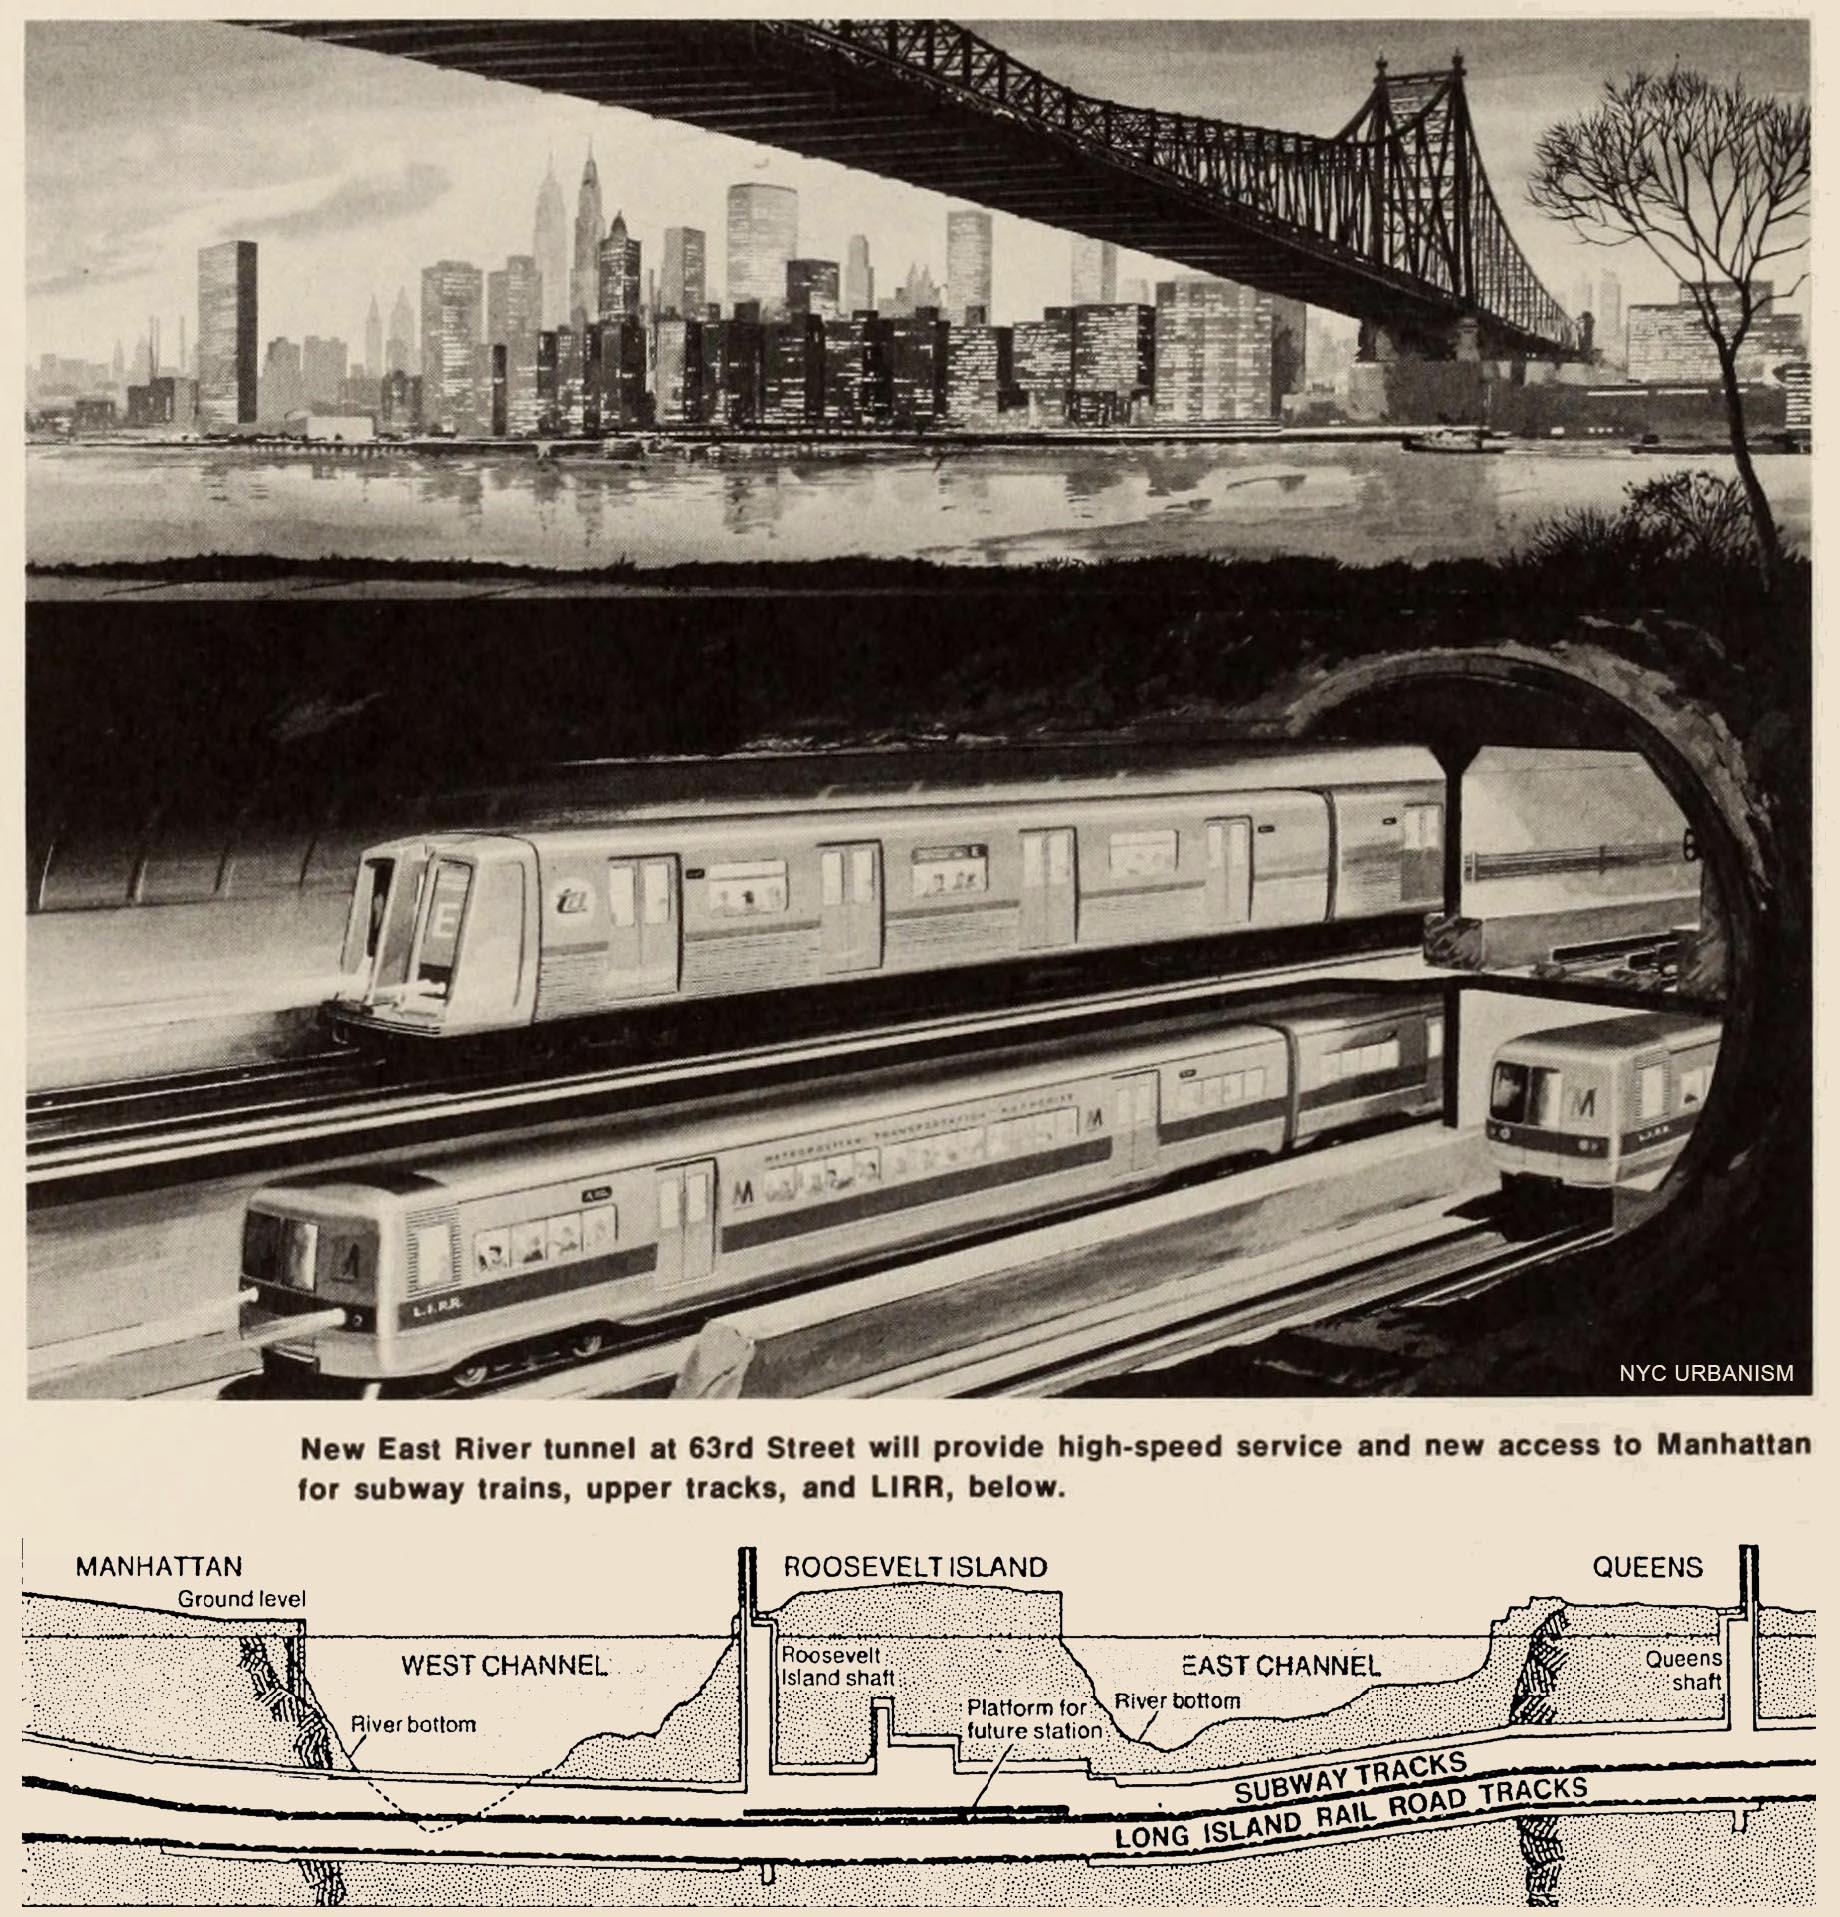 Metropolitan Commuter Transportation Authority, 1968.